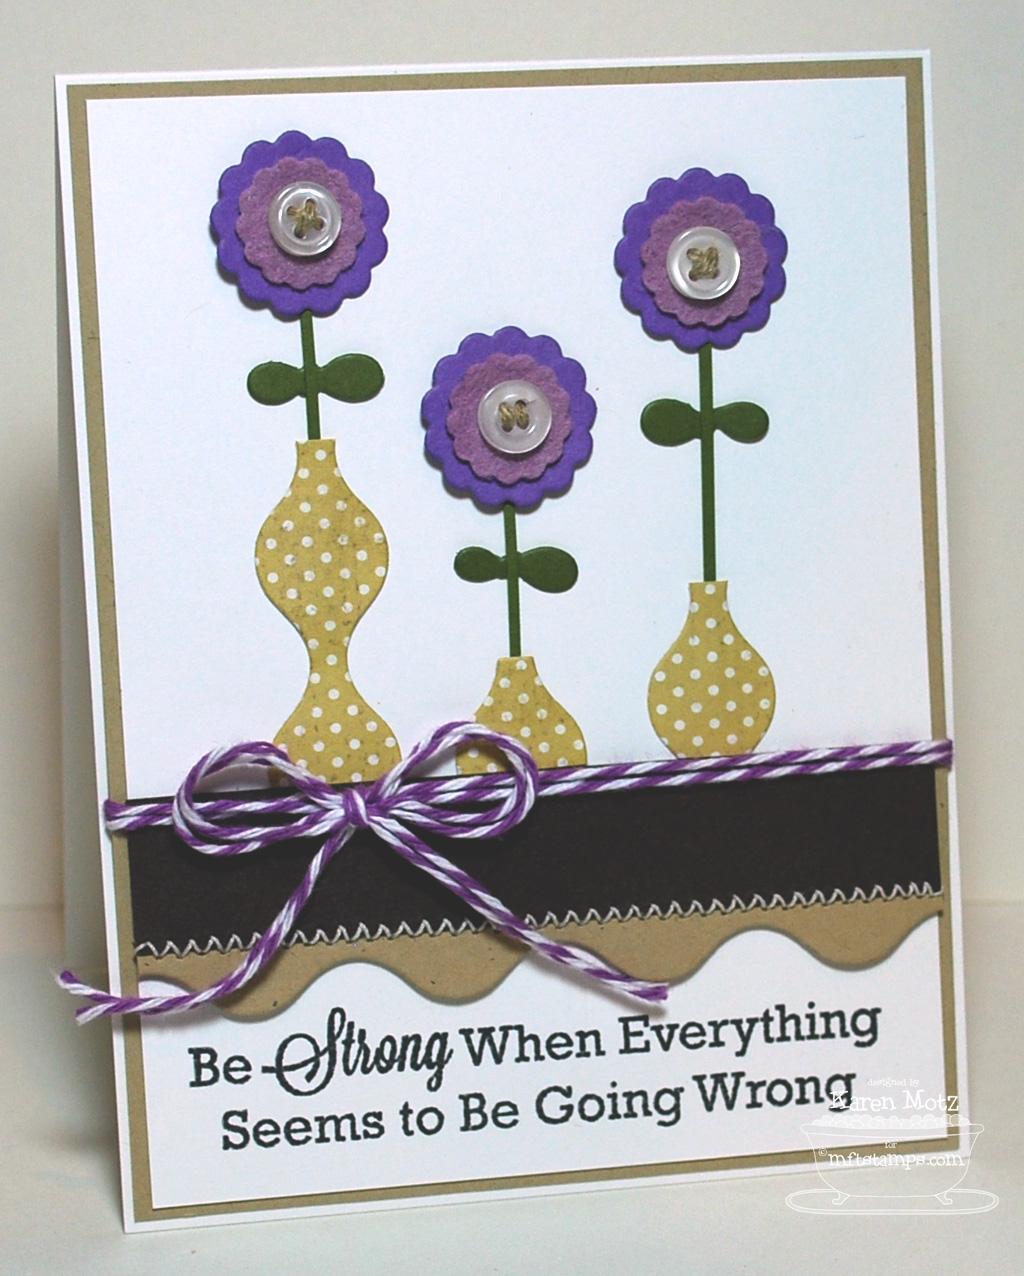 http://3.bp.blogspot.com/-7mQpeazHv_8/T_JPYT_q7iI/AAAAAAAAJHM/1HCP_t3-RuI/s1600/Be-Strong-card.jpg